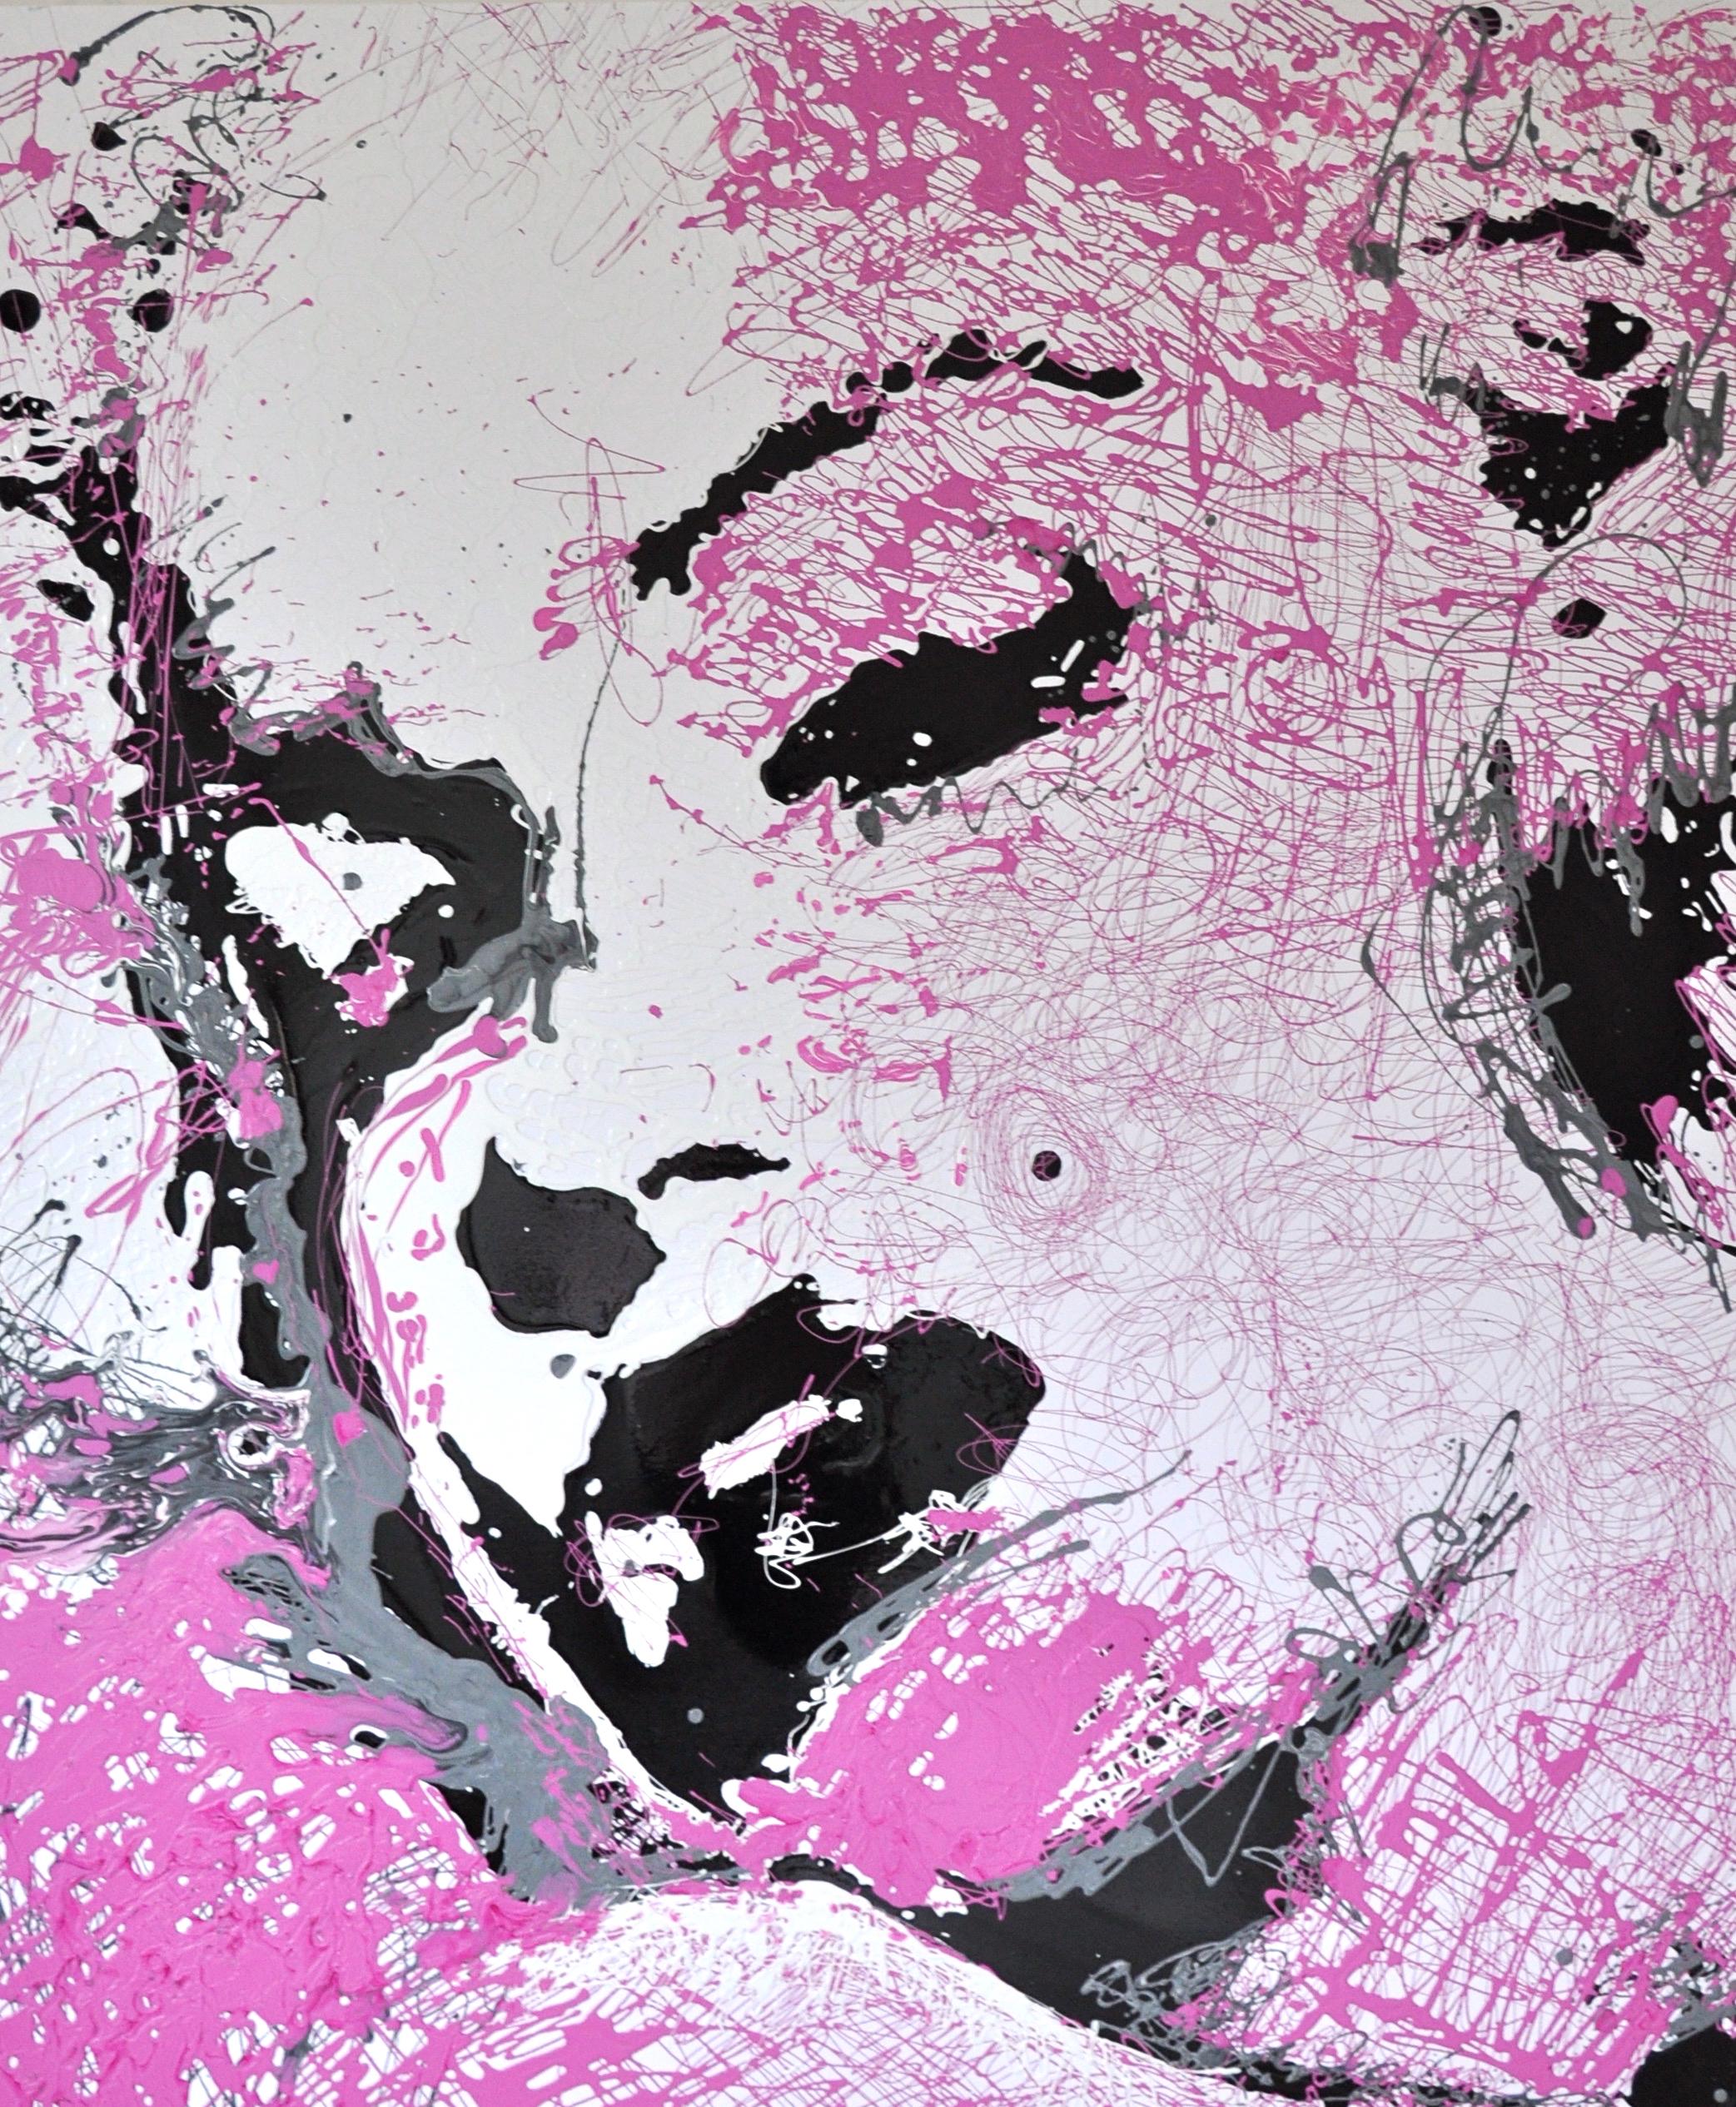 Monroe dripped by steph fonteyn zsh4kz